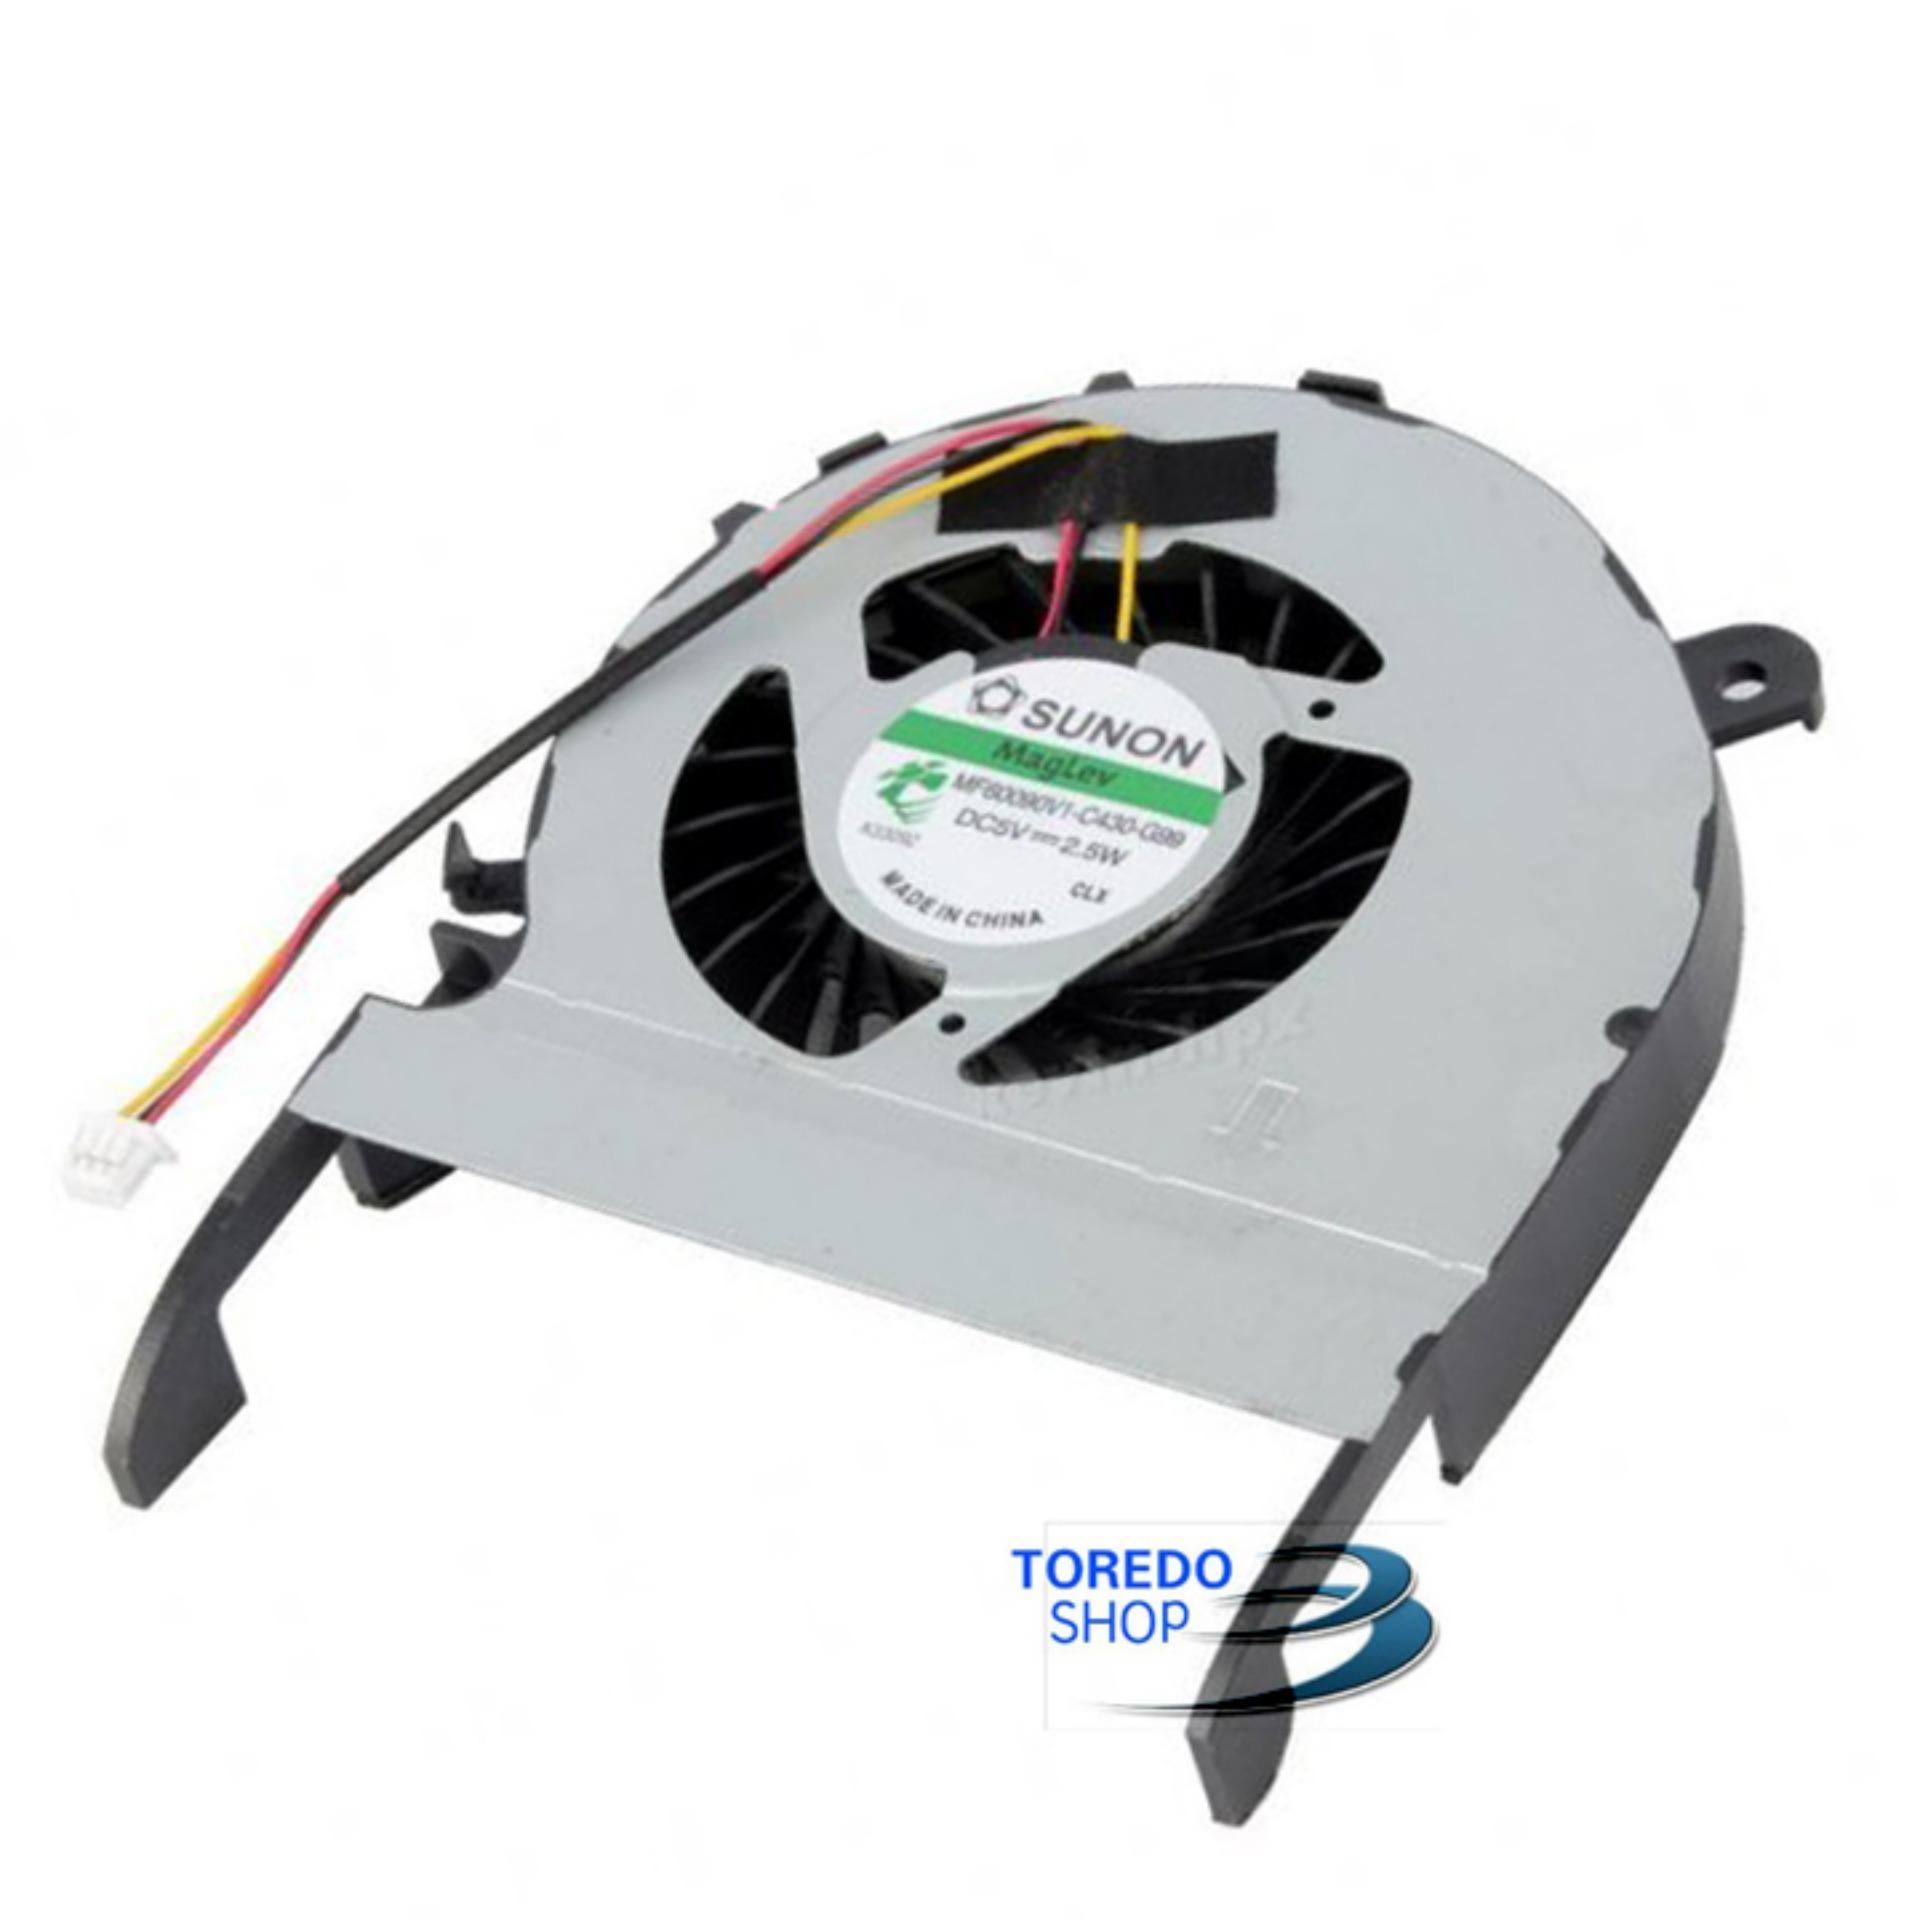 Fan Laptop Toshiba Satellite C800 C805 C840 L800 L840 M800 M805 M840